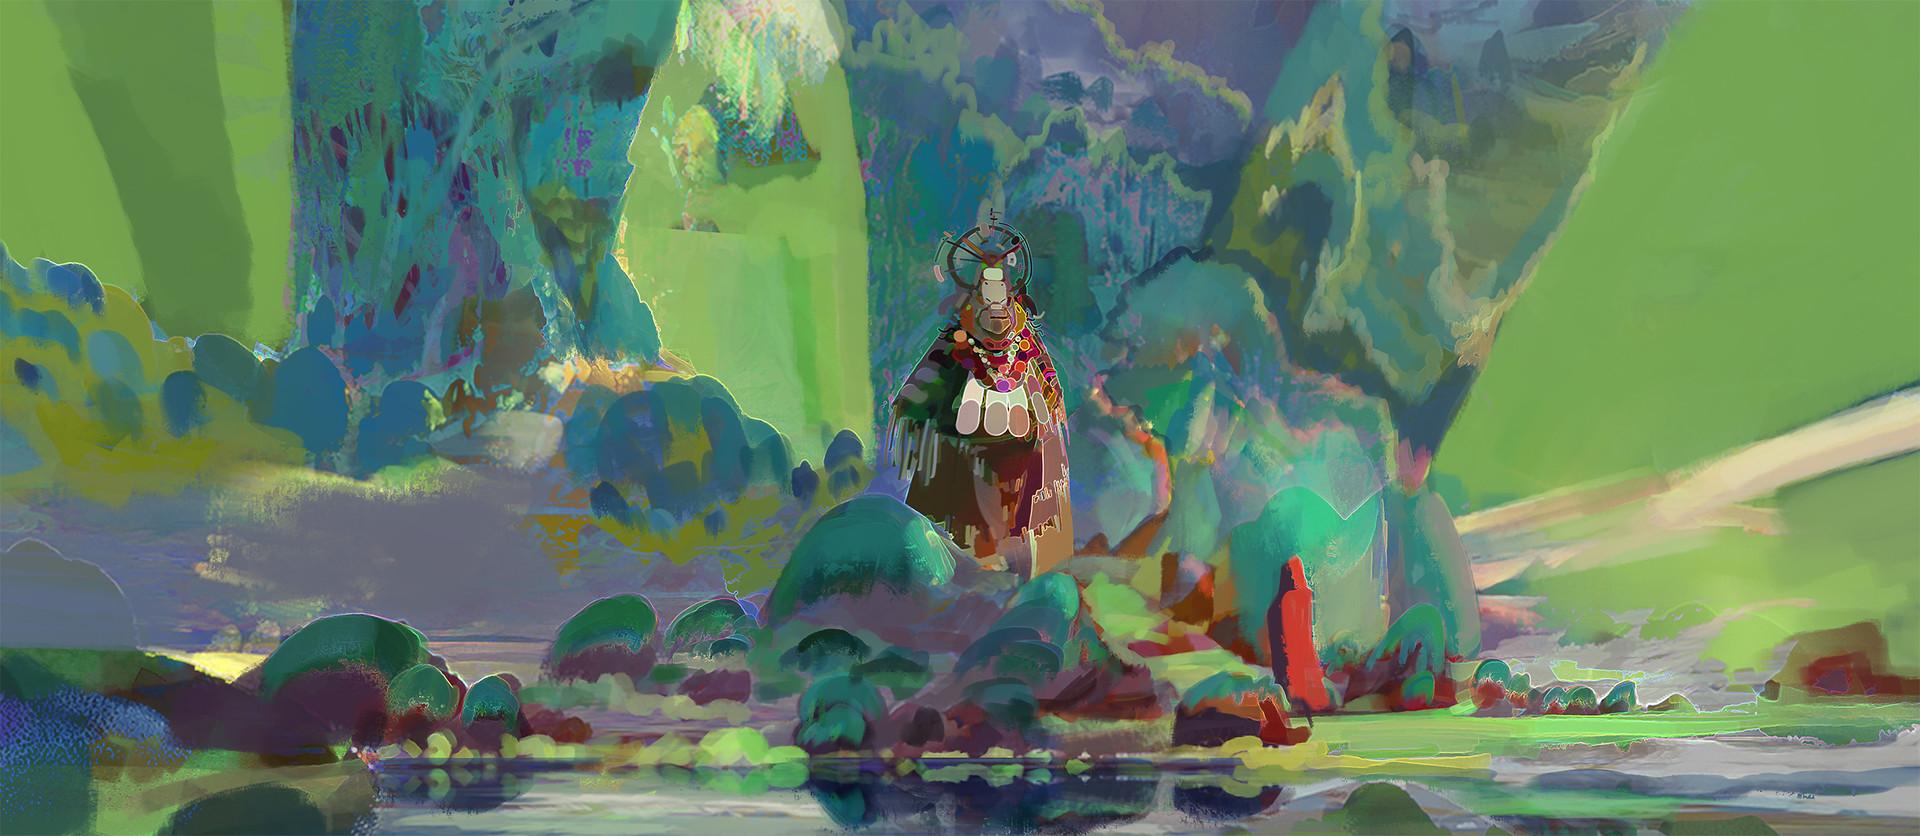 Nicodemus john mattisson forest shaman